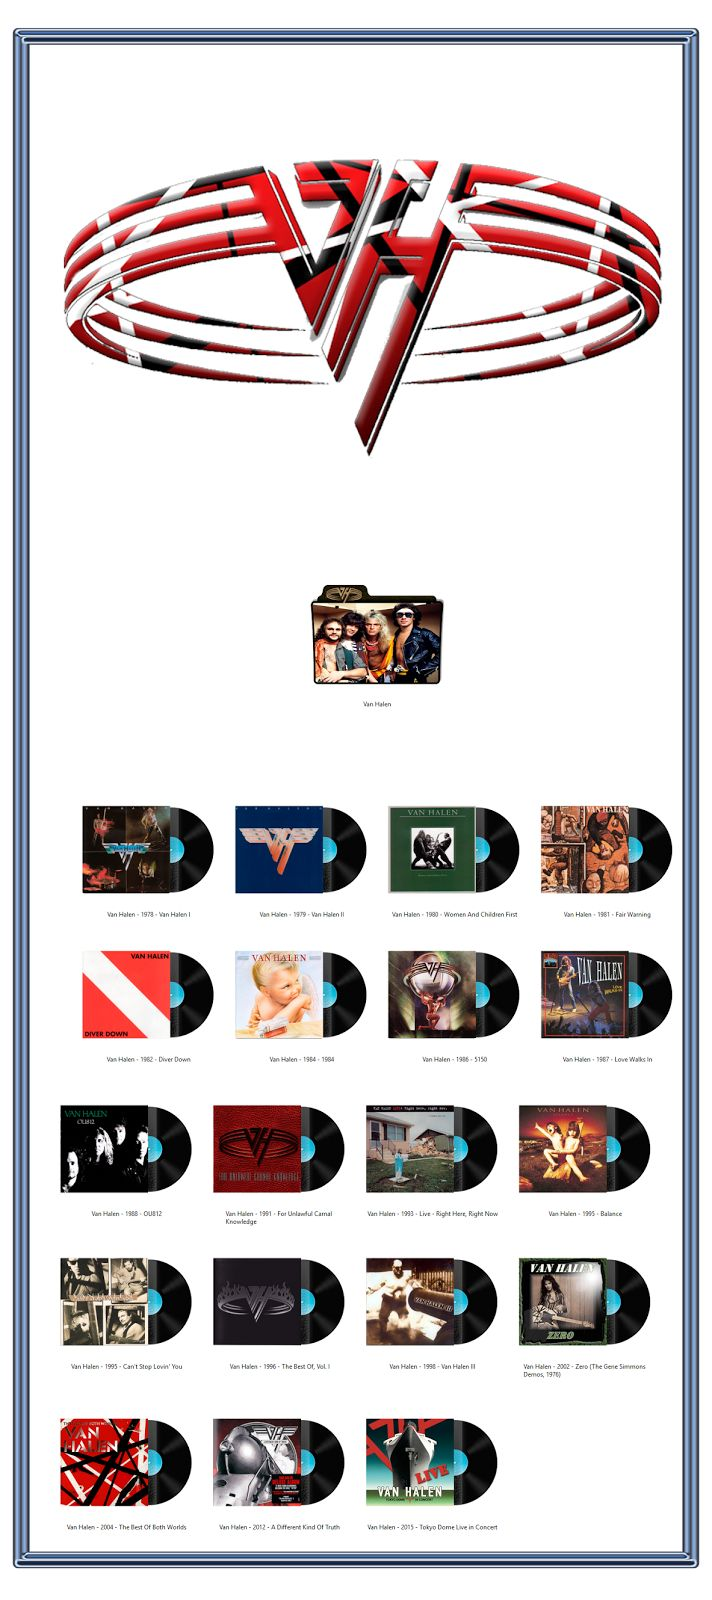 Album Art Icons: Van Halen Discography Icons (ICO & PNG)